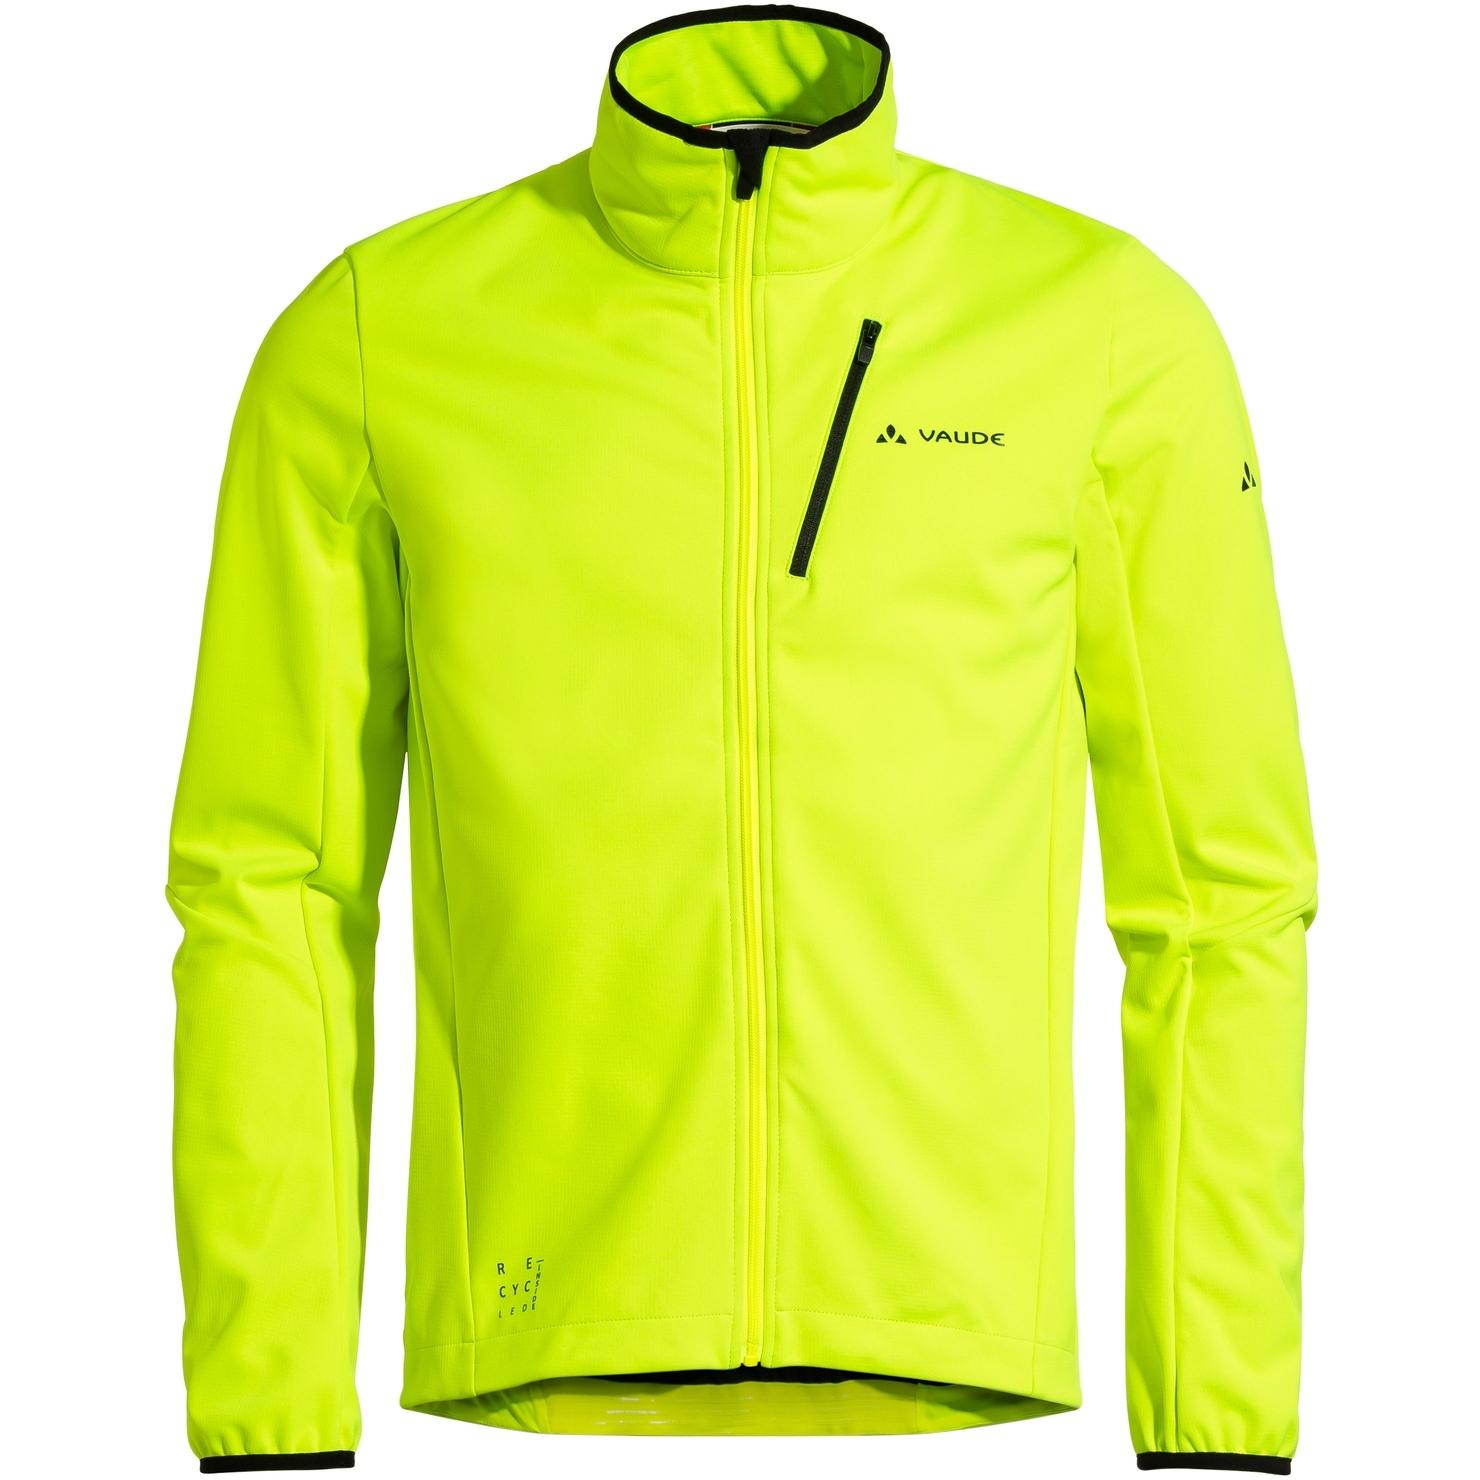 Vaude Matera Softshell Jacke - neon gelb